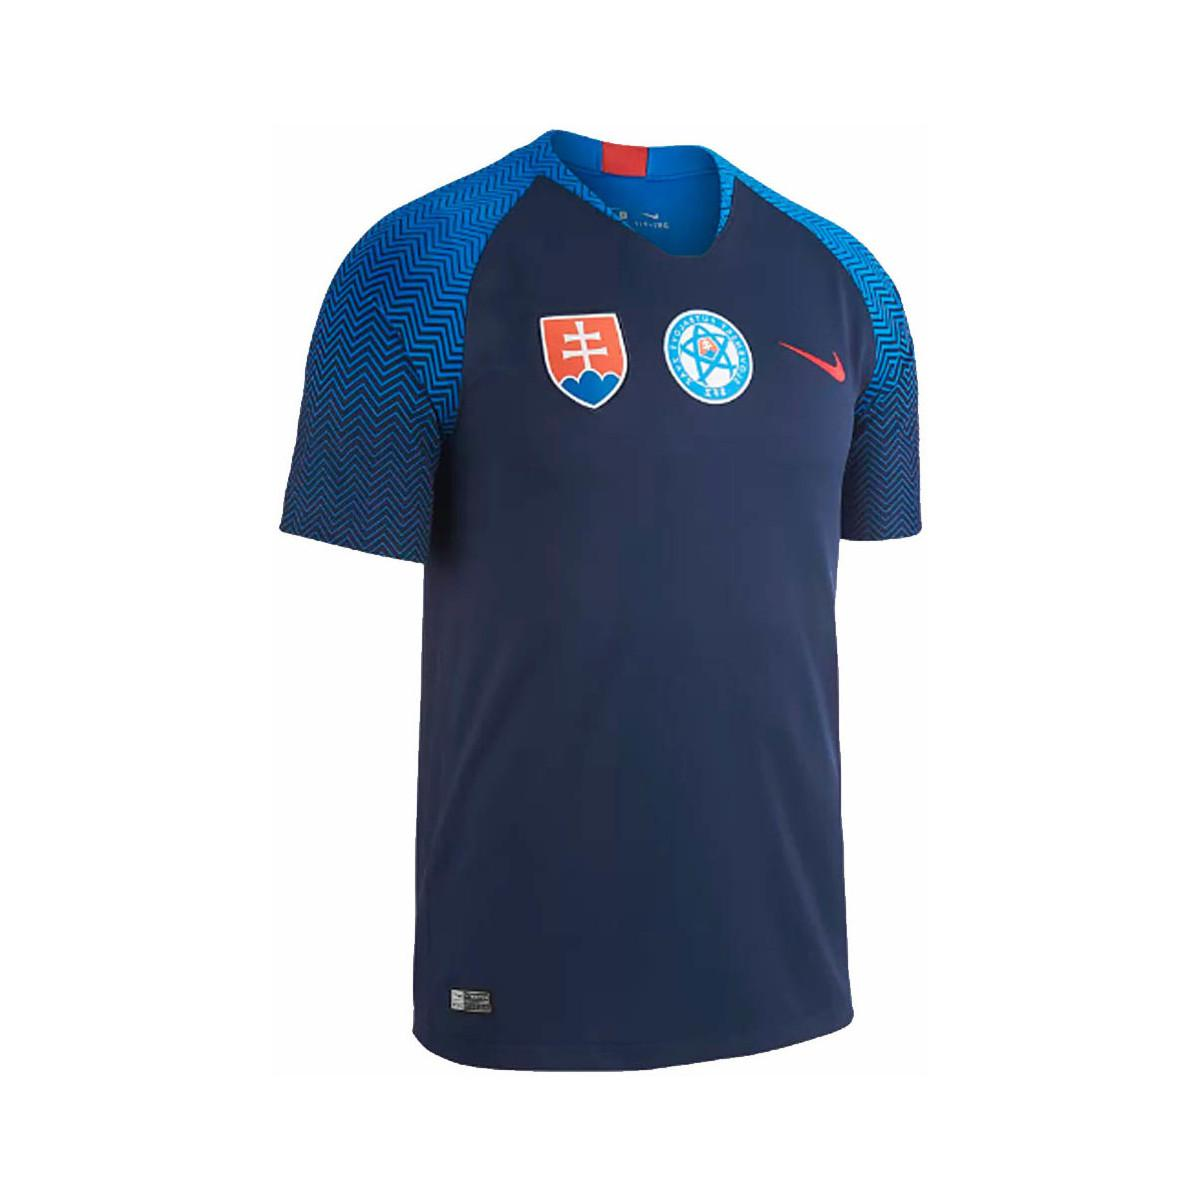 Nike 2018-2019 Slovakia Away Football Shirt Men s T Shirt In Blue in ... c636b8f4f85